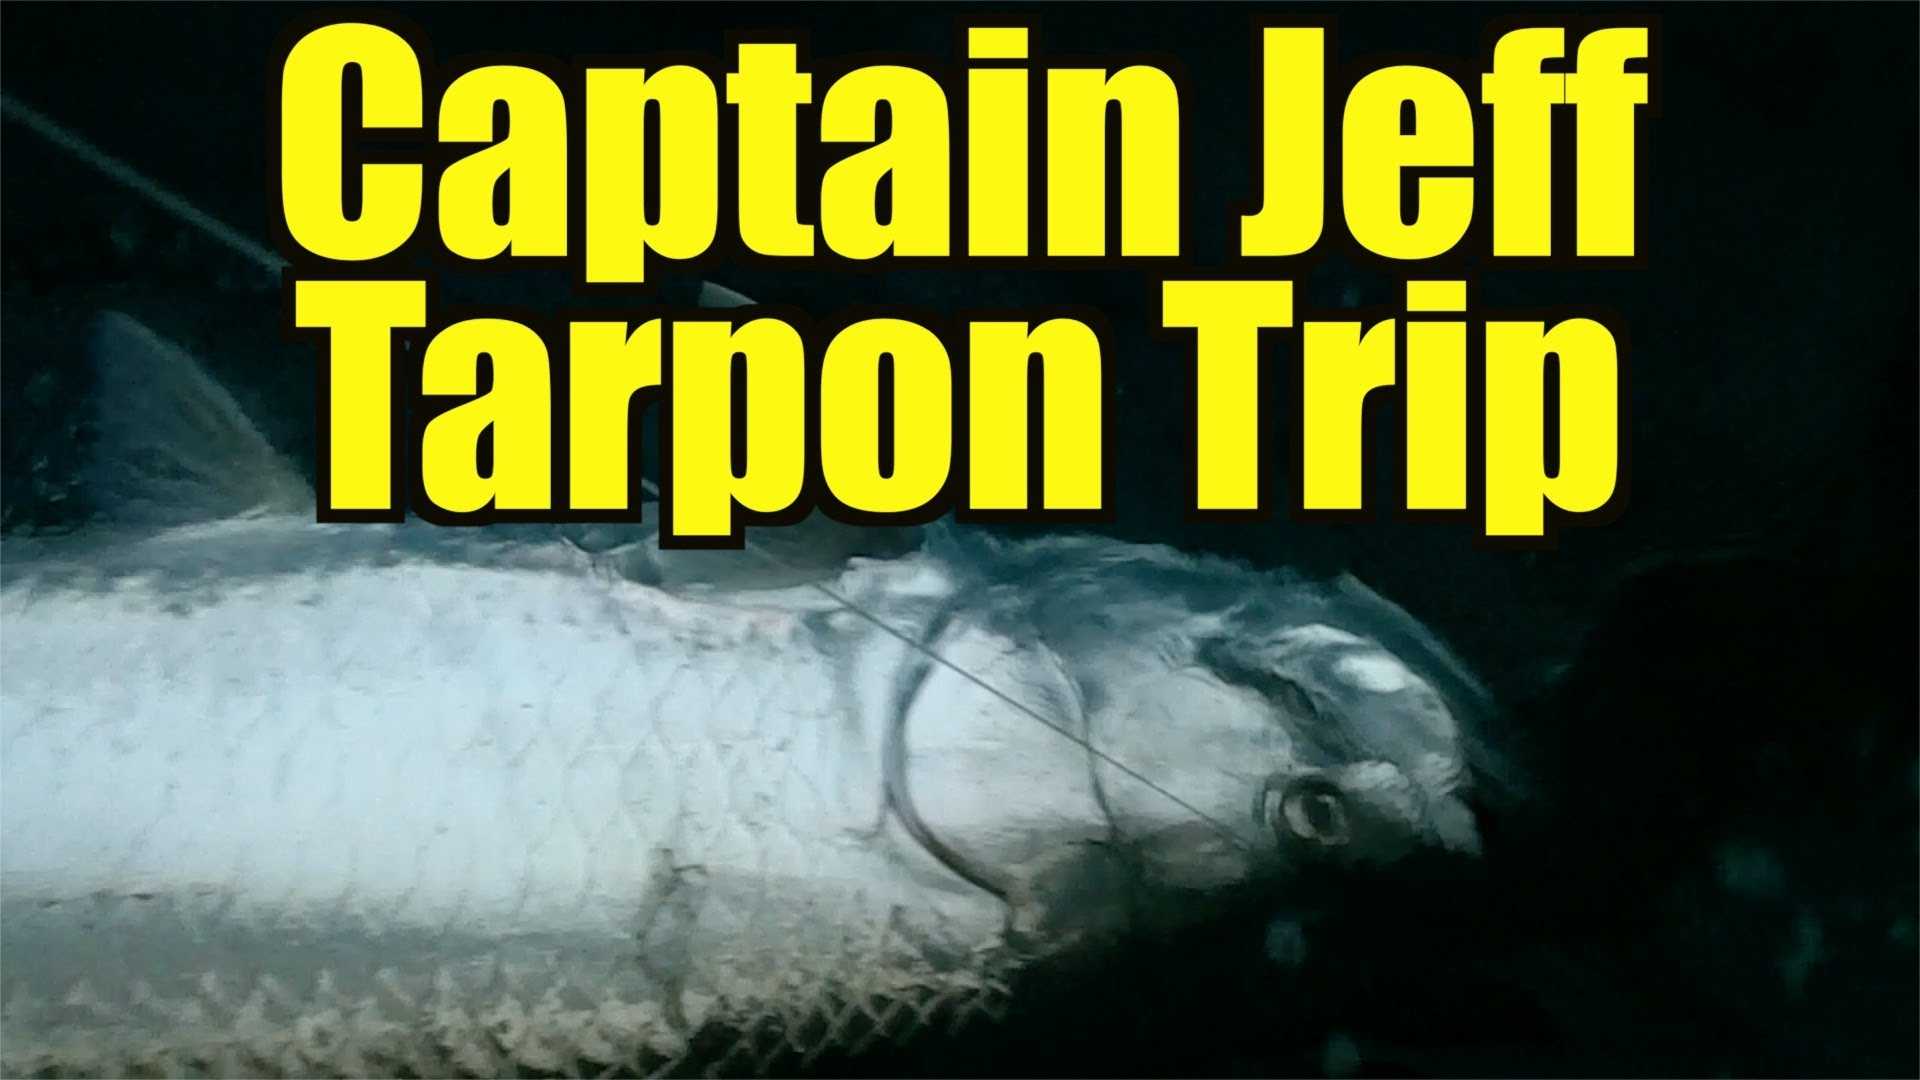 Captain Jeff Fishing Show Ep. 592